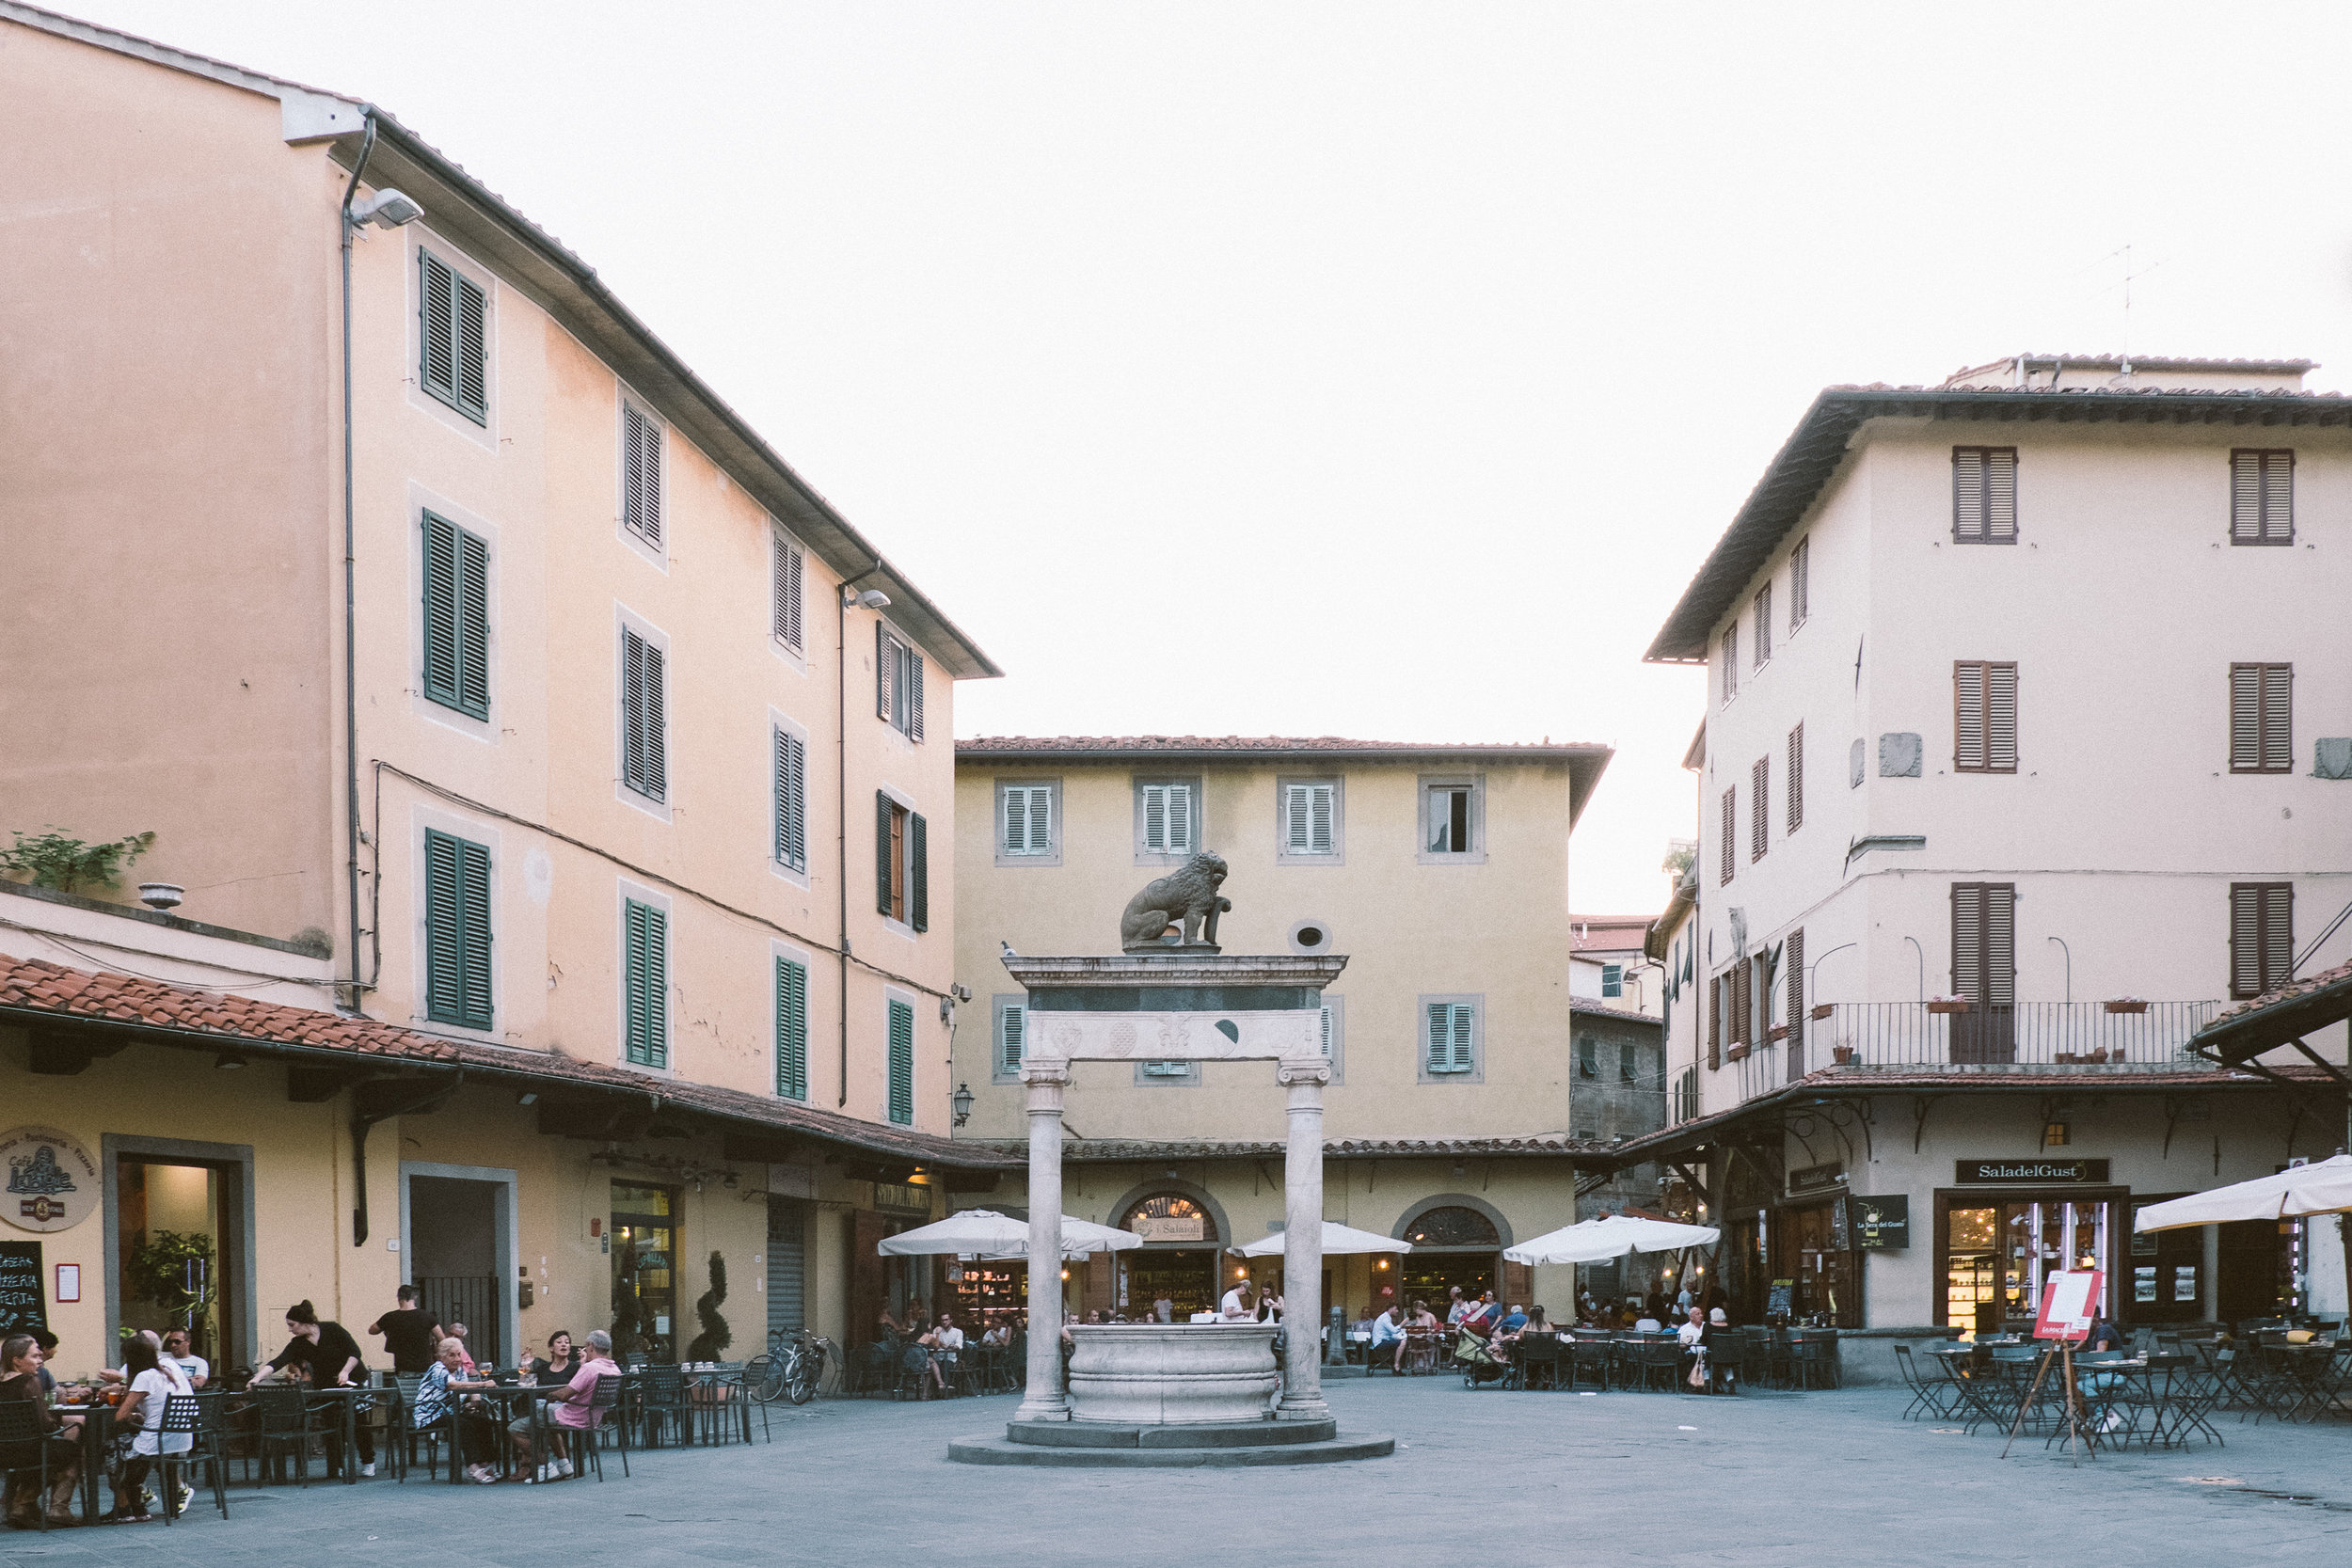 Piazza della Sala has a variety of restaurants and bars